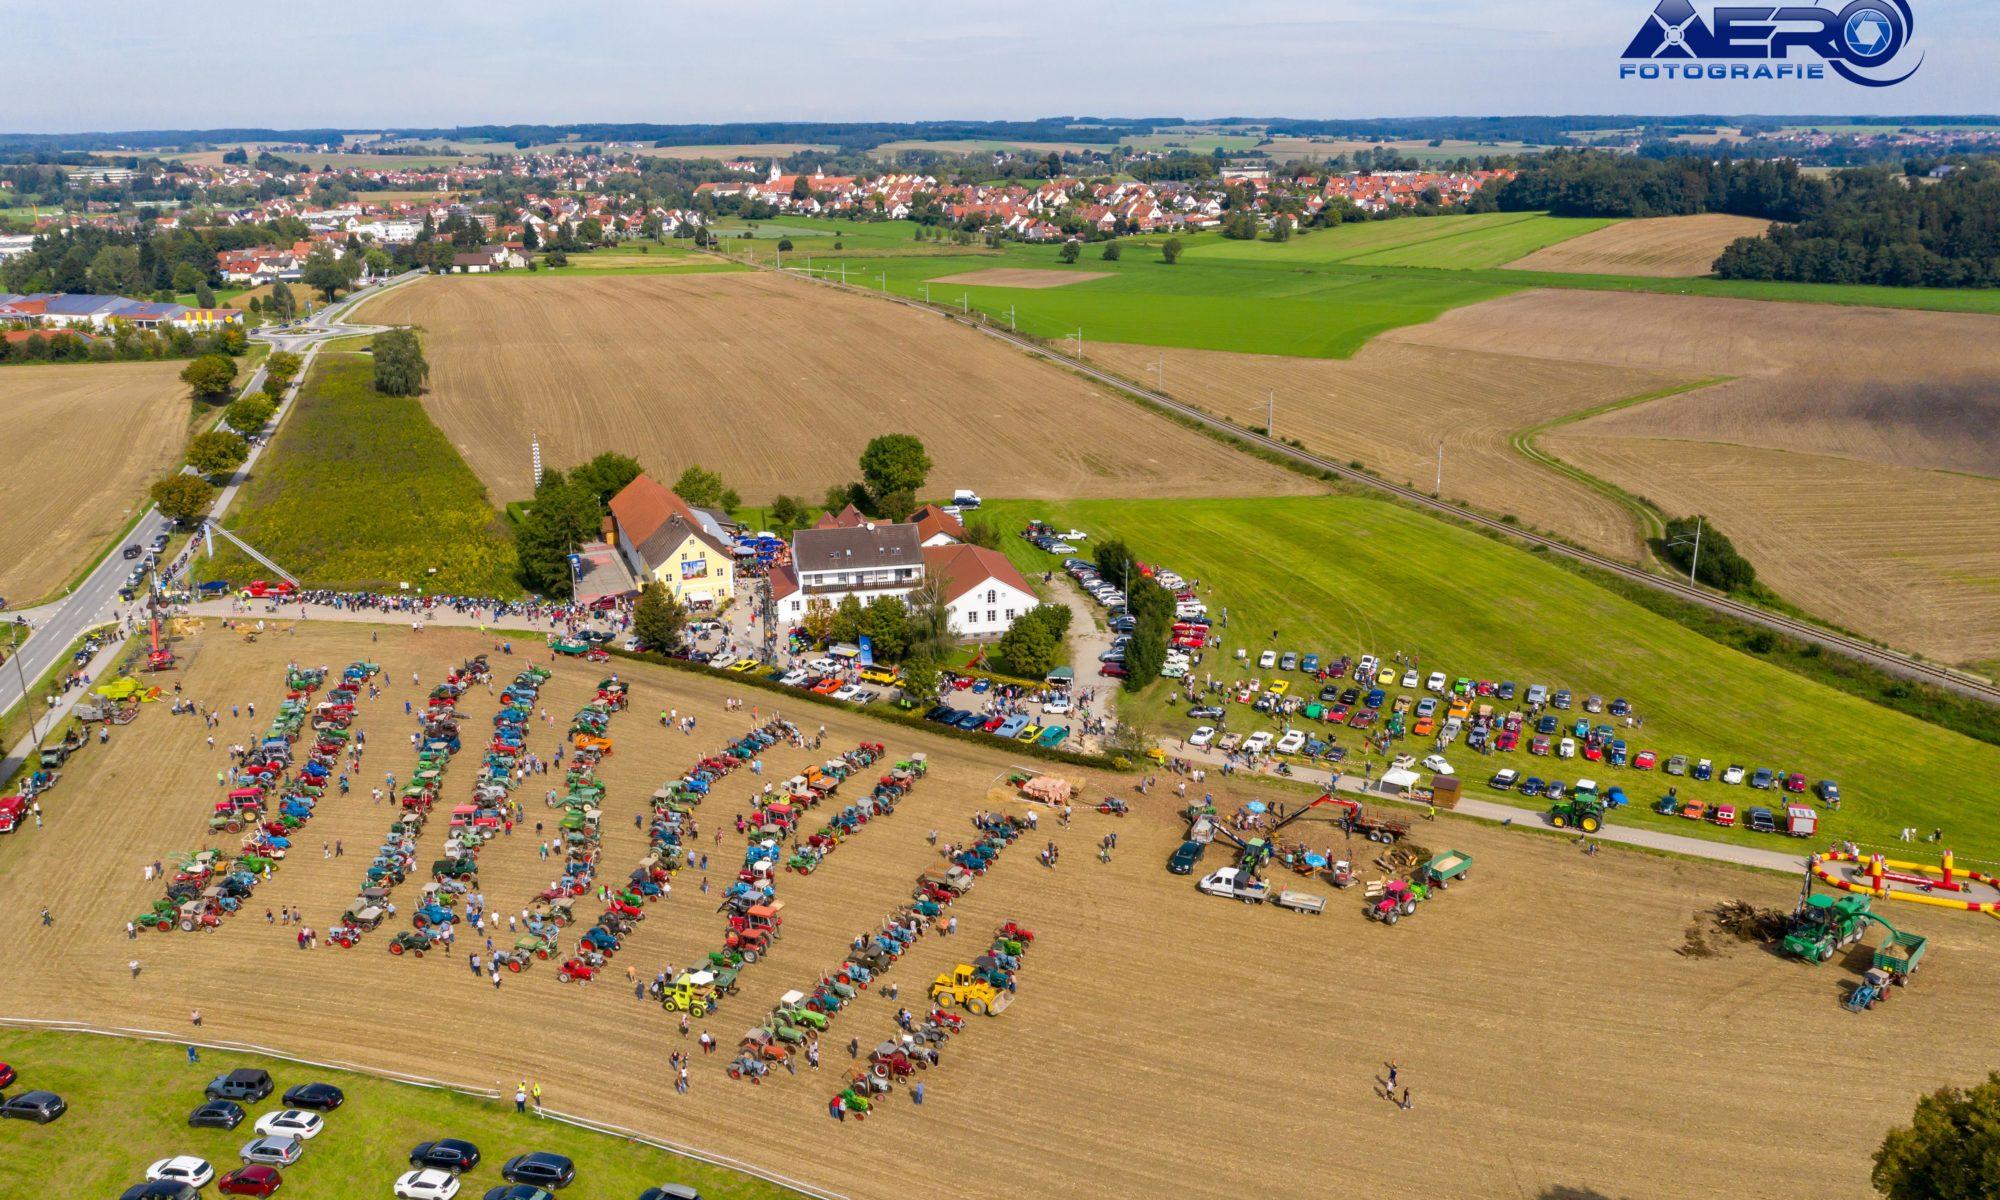 Oldtimertreffen Panorama Luftbild Ried